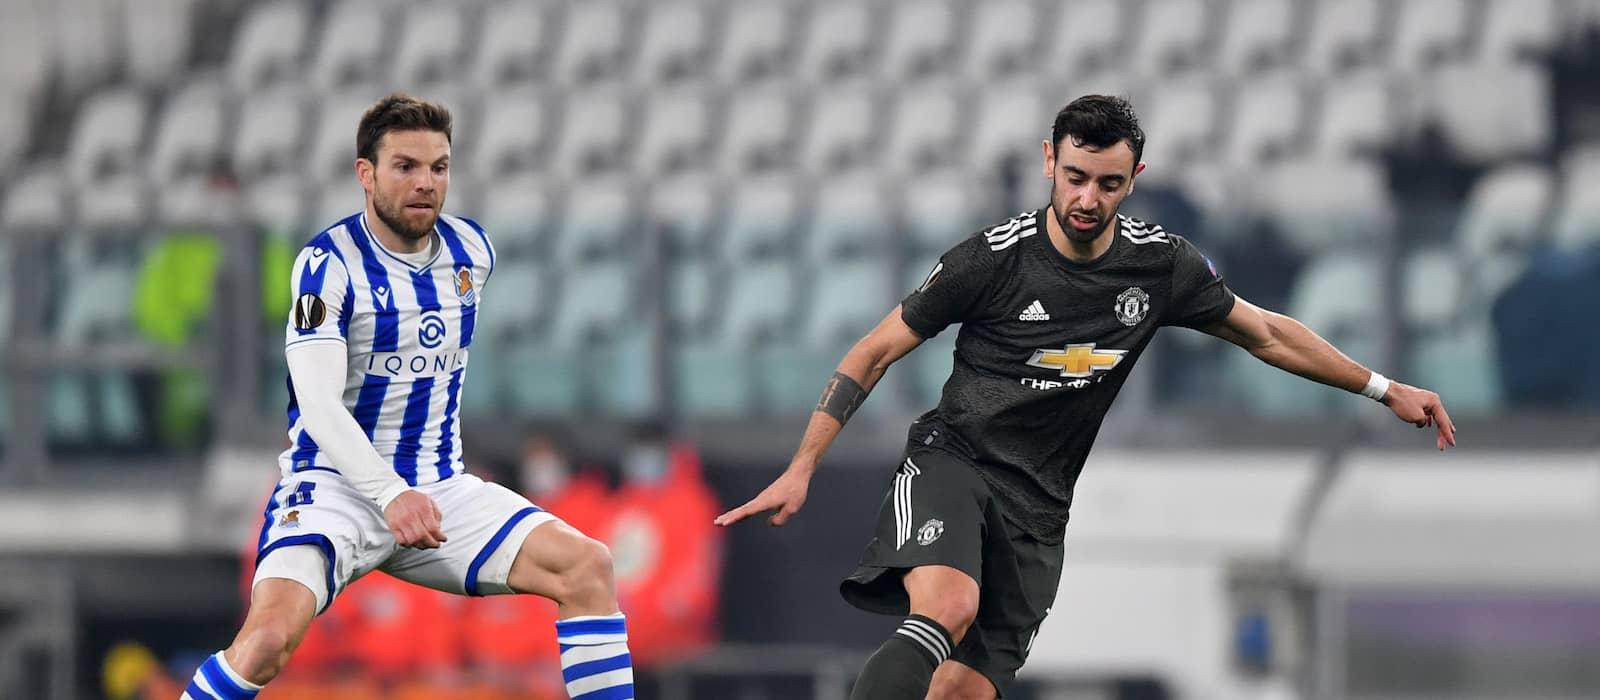 Bruno Fernandes puts on brilliant show vs Real Sociedad